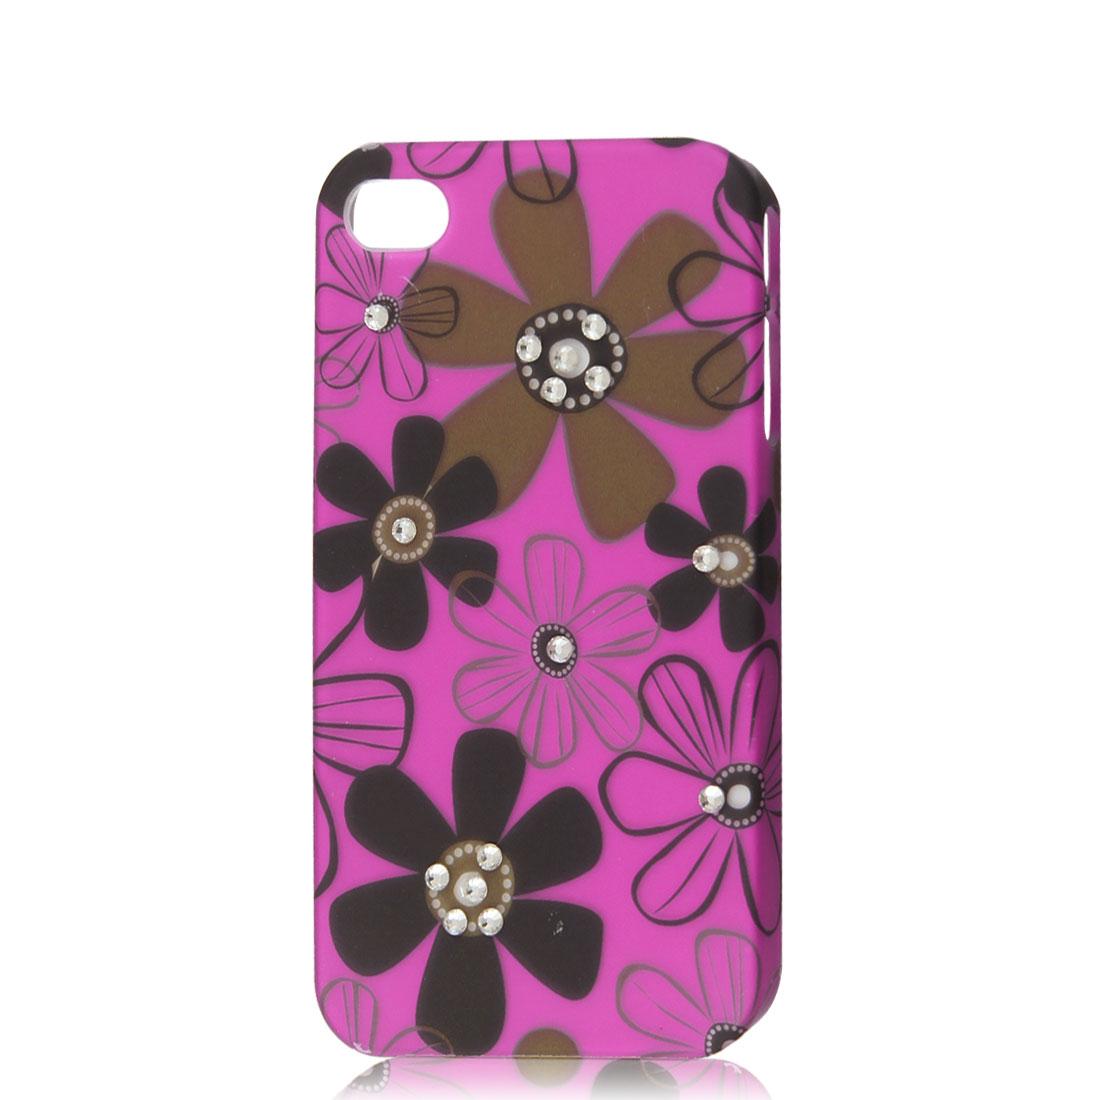 Fuchsia Rhinestone Flower Protective Hard Back Case Cover Skin for iPhone 4 4G